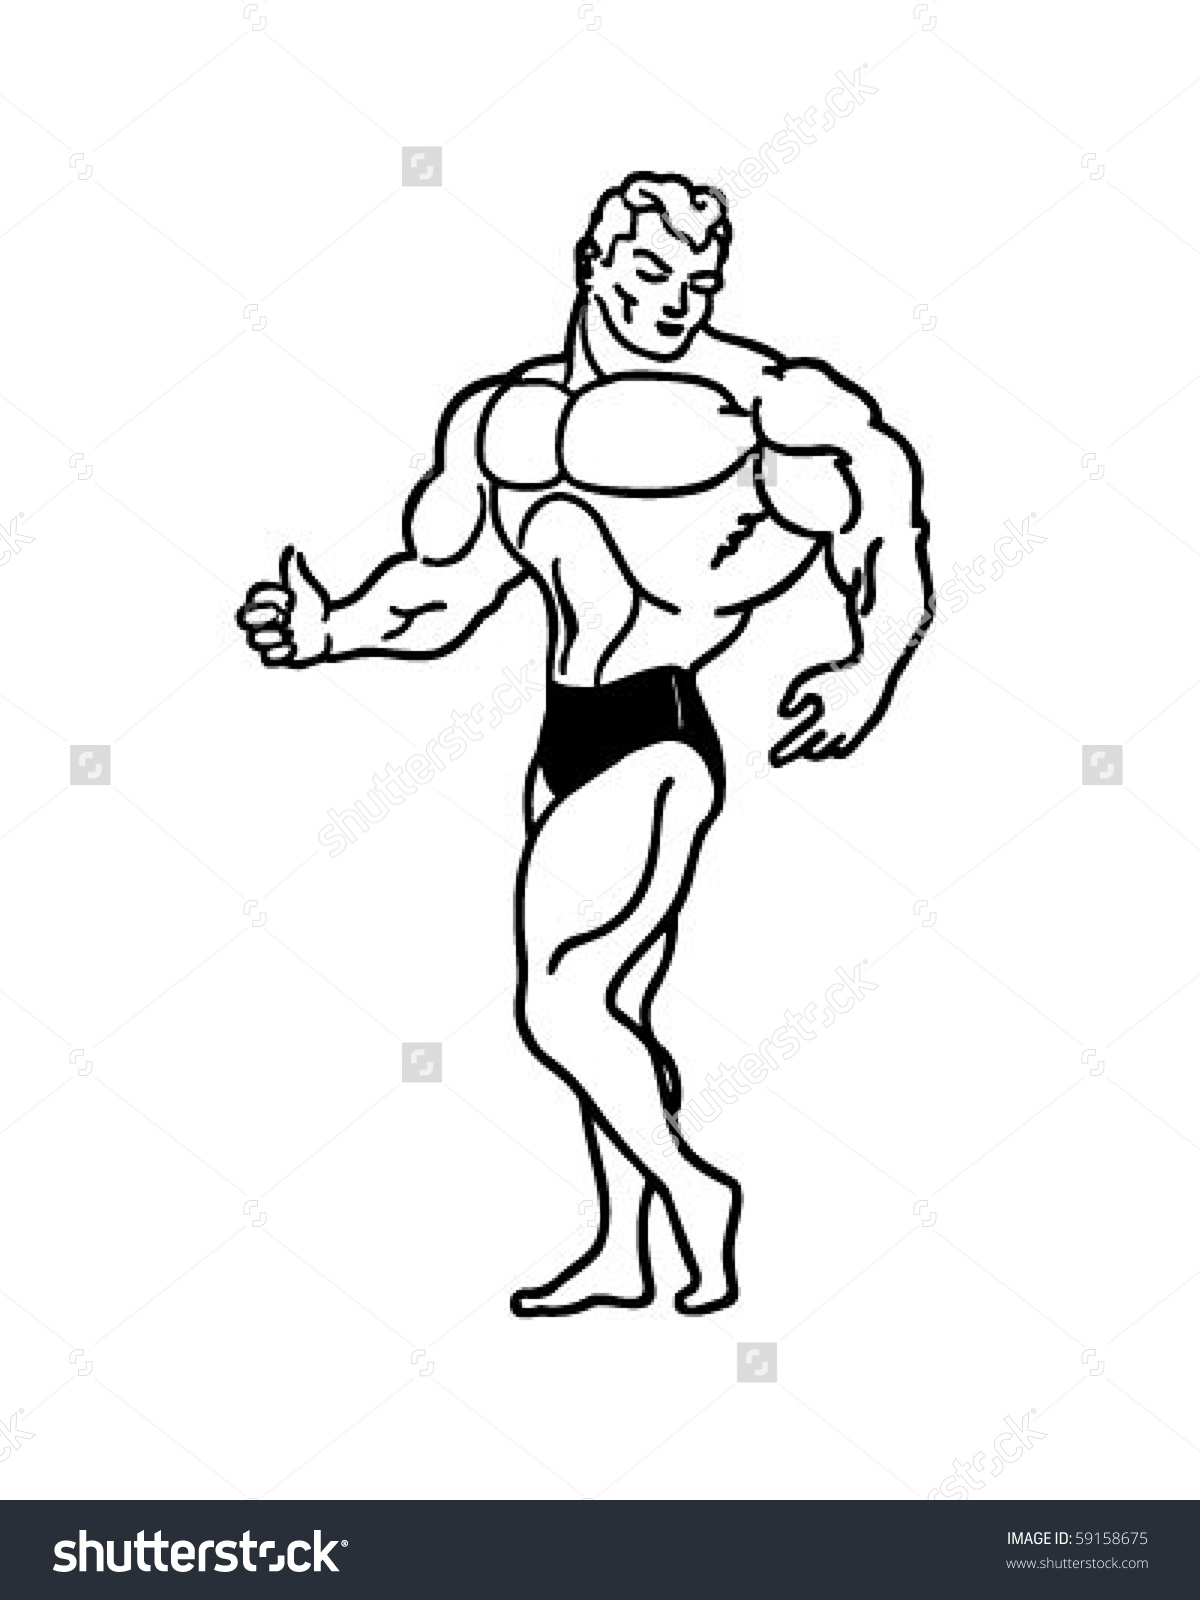 Muscle Man - Retro Clip Art